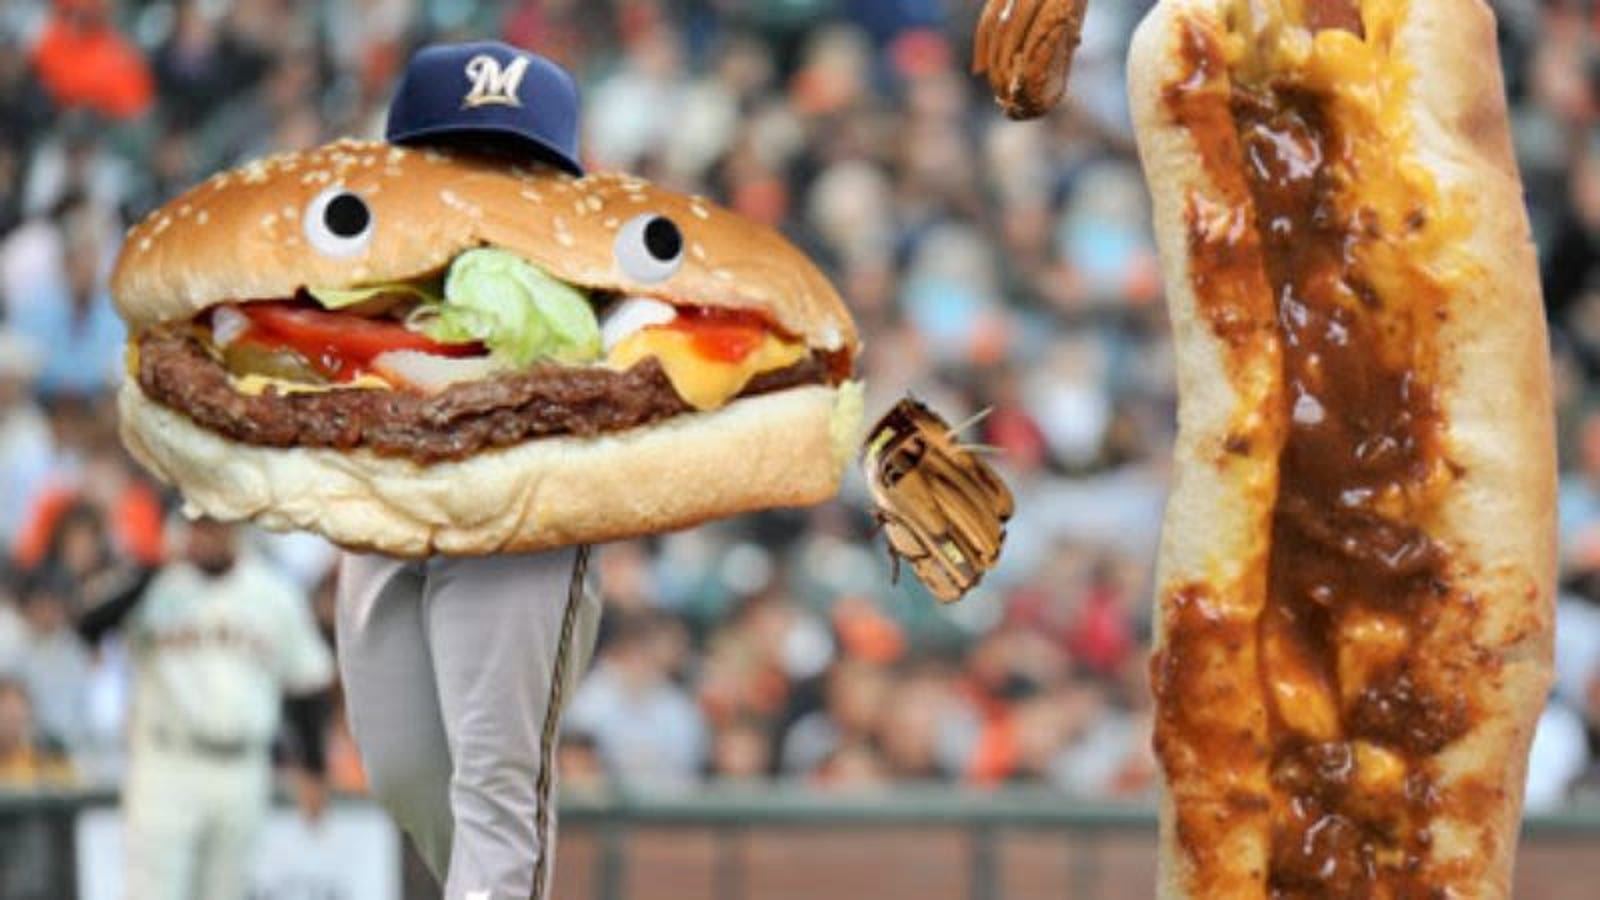 C.C. Sabathia, Prince Fielder Keep Imagining Each Other As Giant Talking Hot Dog, Hamburger